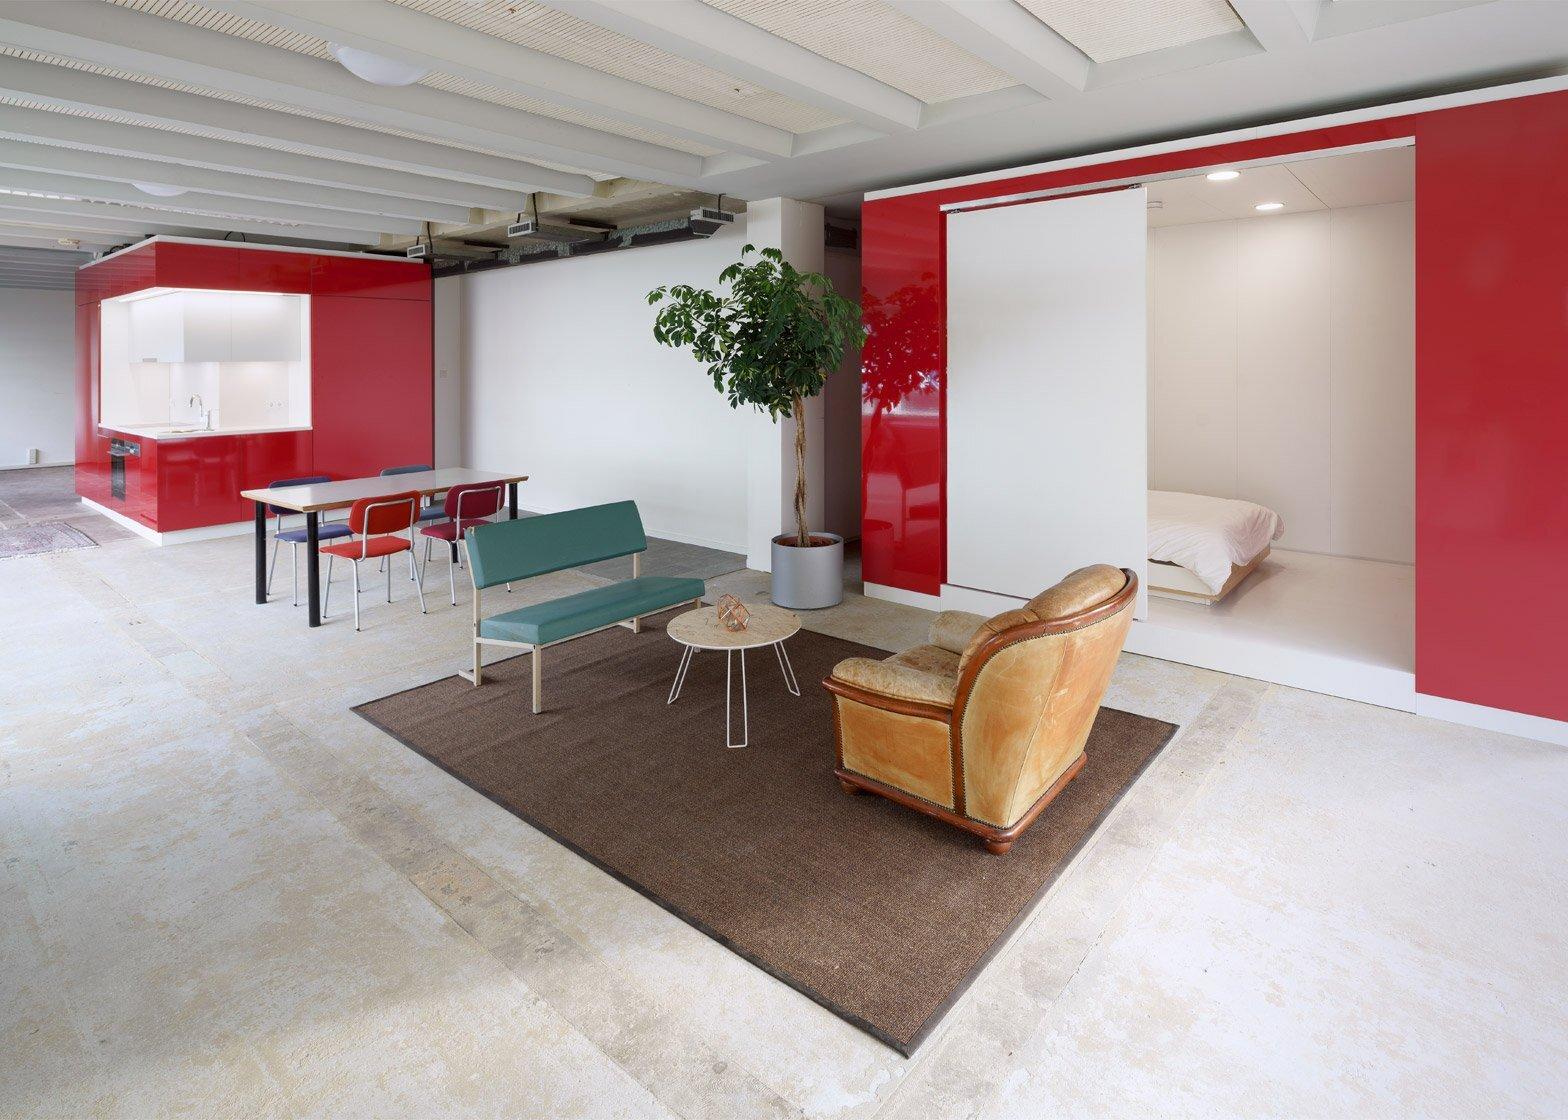 The Hub - Kraaijvanger - Rotterdam - Modular Kitchen and Bathroom 3 - Humble Homes